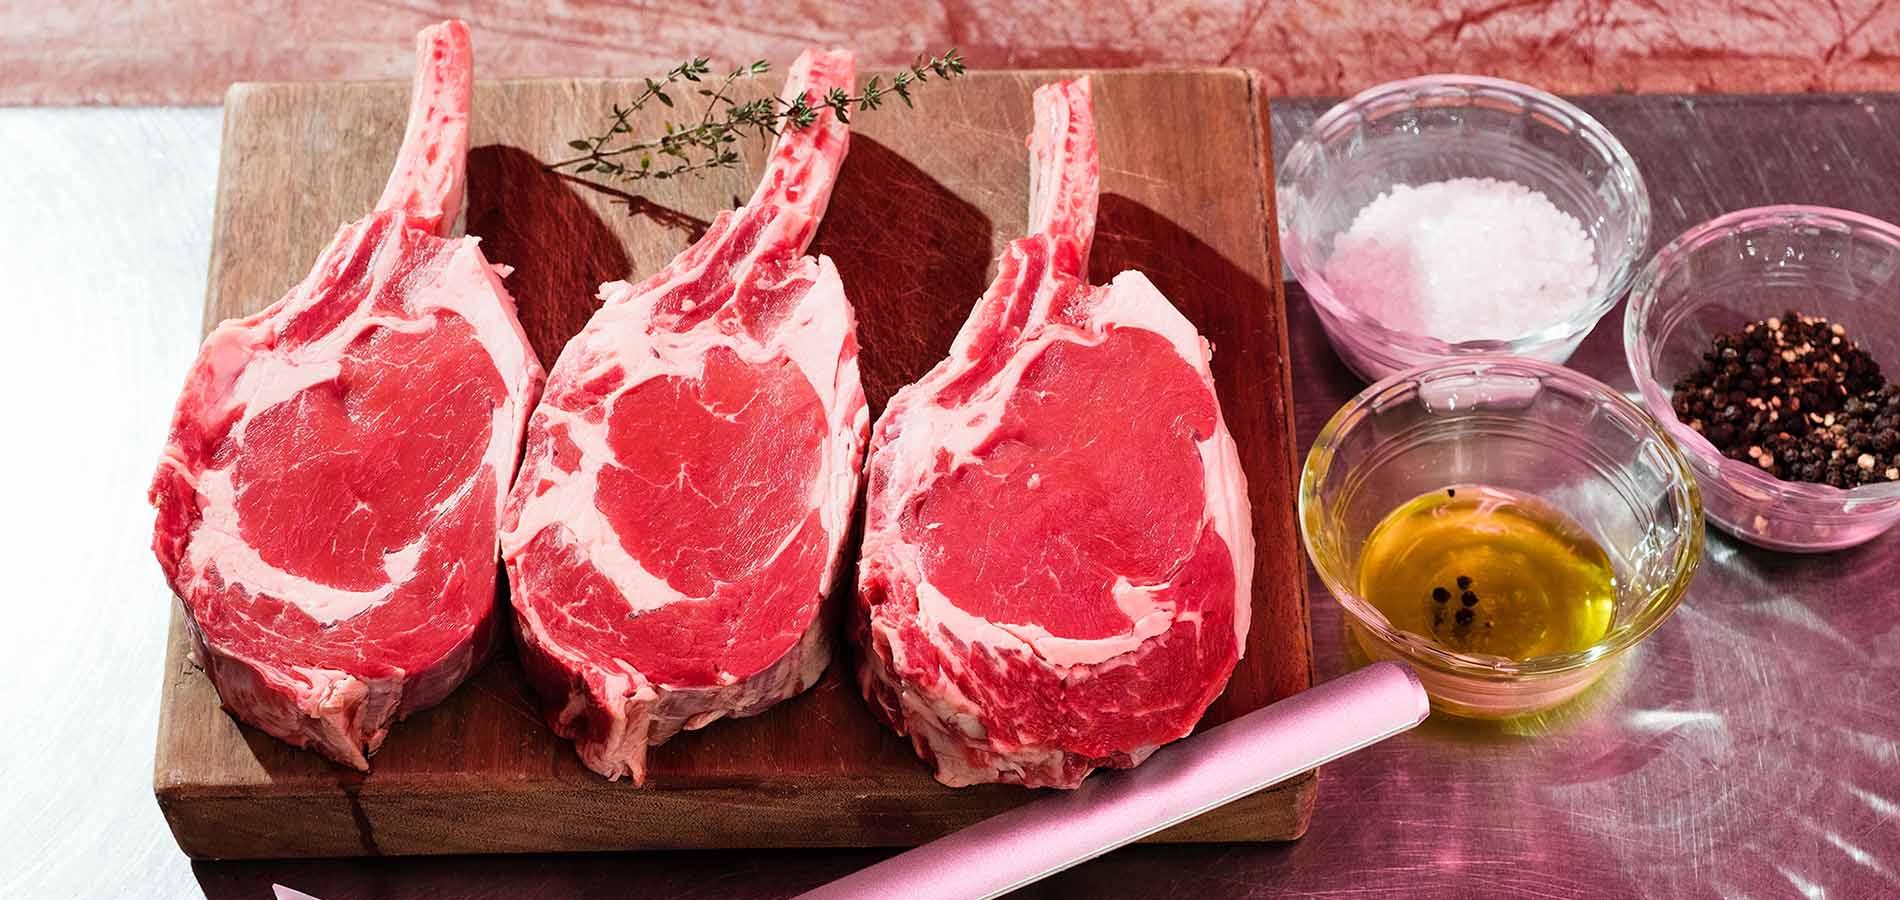 Beef - Devitt Wholesale Meats